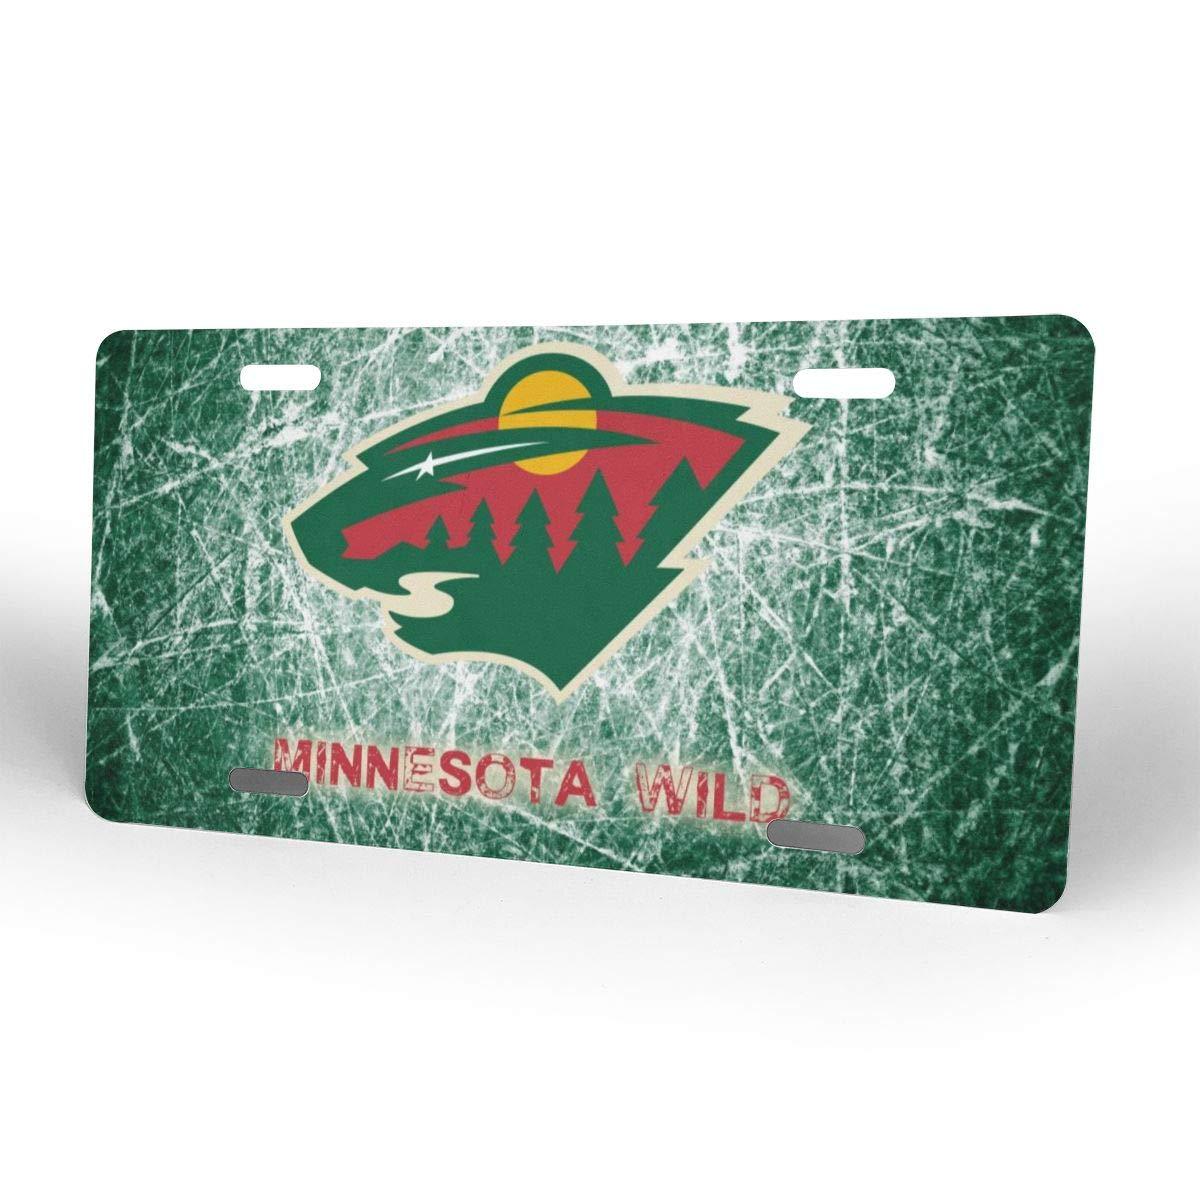 Greicmn NHL Minnesota Wild 6 x 12 inch Metal License Plate Frame